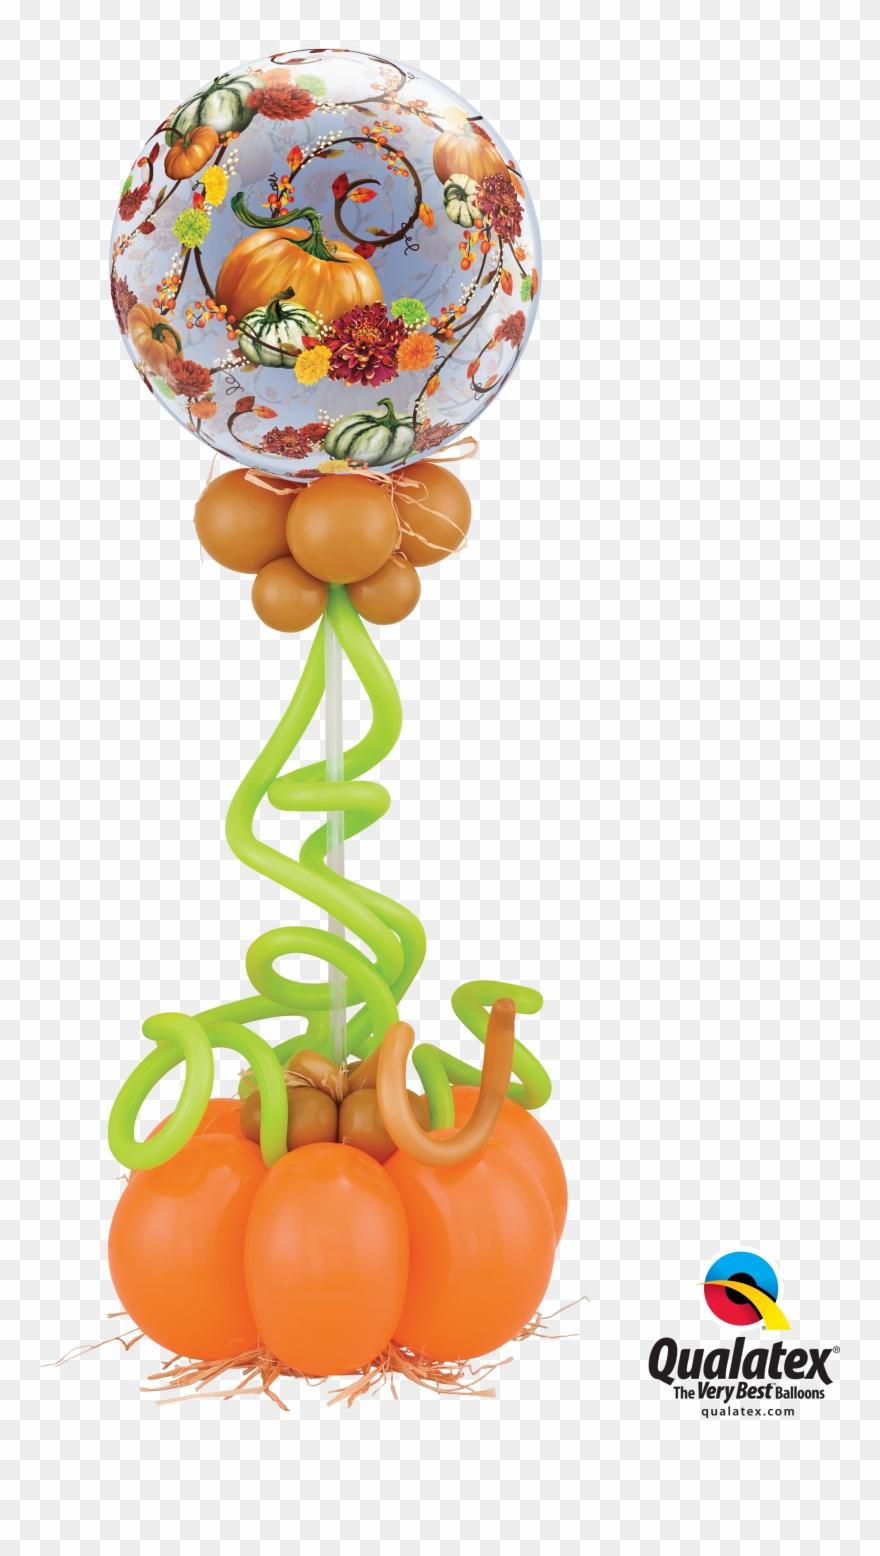 Centerpieve clipart jpg library stock Autumn Floral Centerpiece - Balloons Centerpiece Png Clipart ... jpg library stock